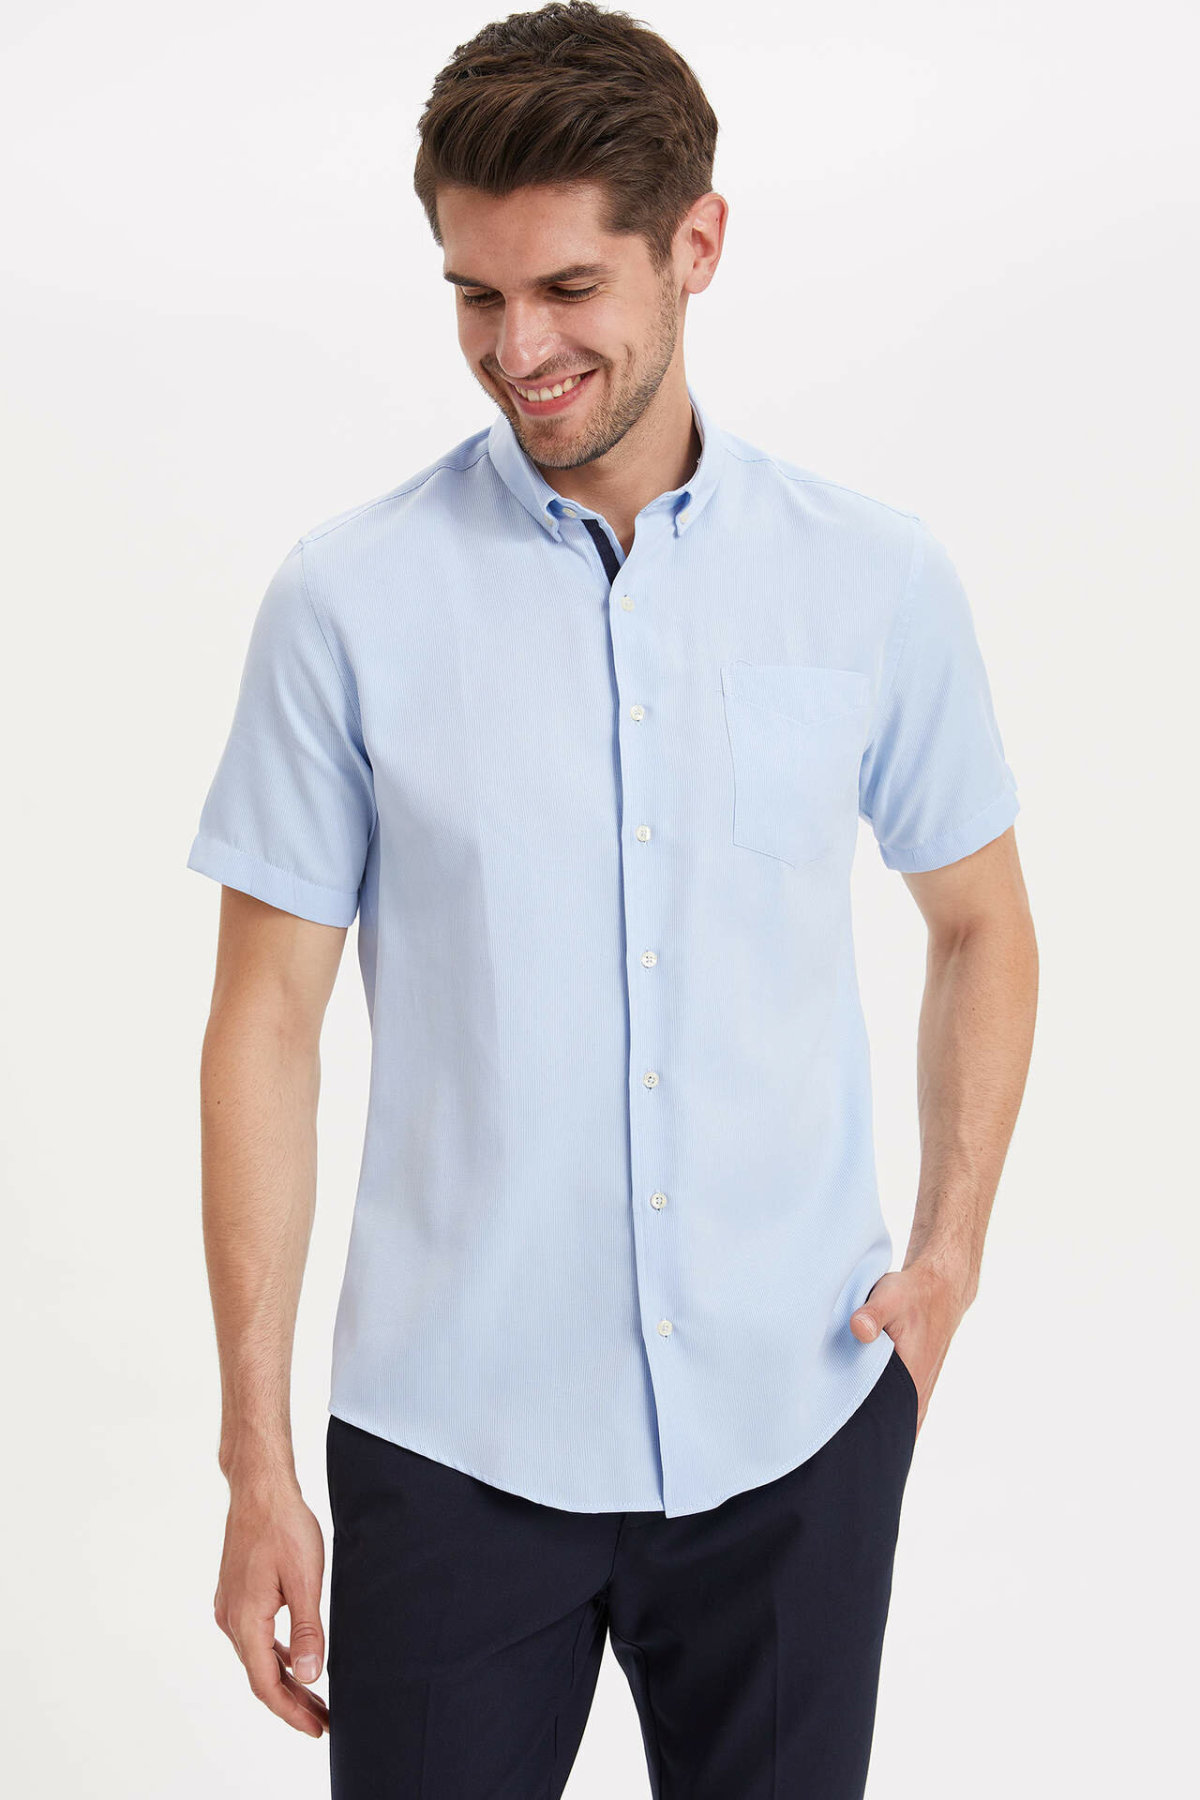 DeFacto Man Fashion Short Sleeve Shirt Summer Men's Pure Color Pattern Casual Shirts Male Simple Leisure Blouser - K2950AZ19SM